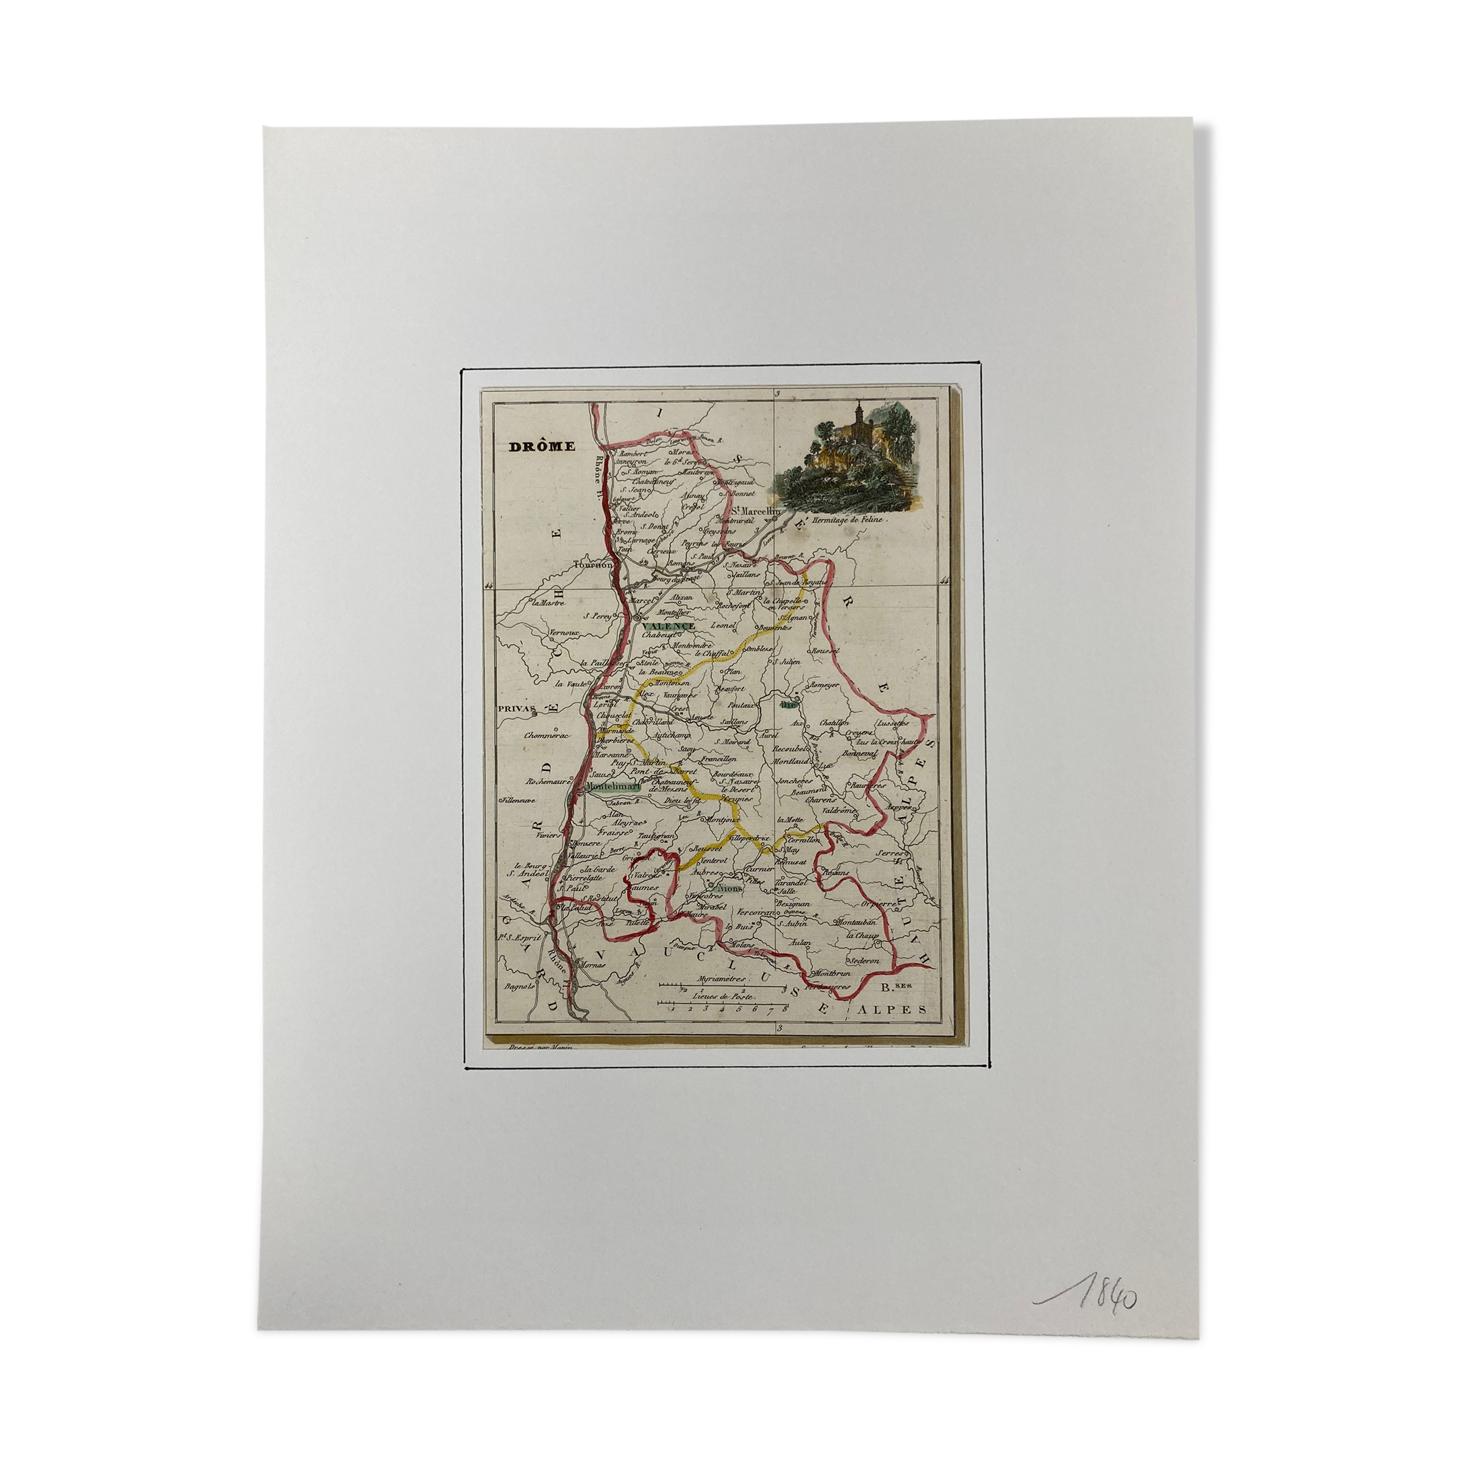 Carte ancienne de la Drôme